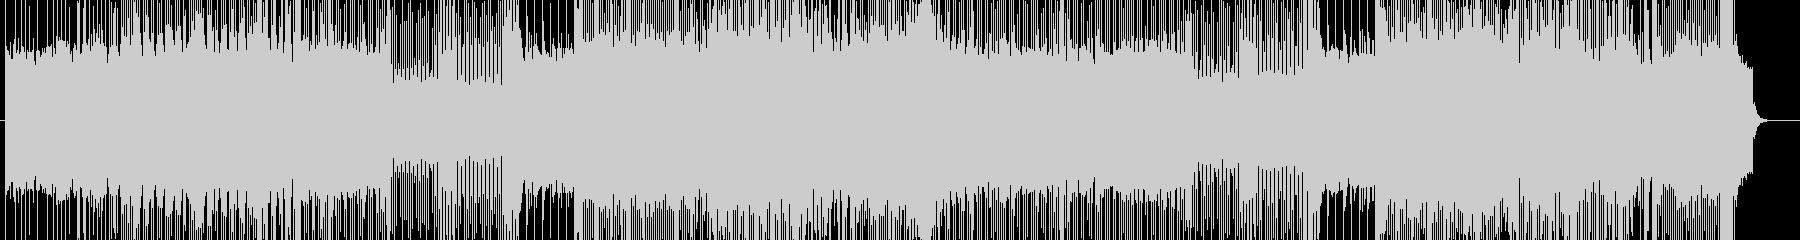 「HR/HM」「DARK」BGM141の未再生の波形